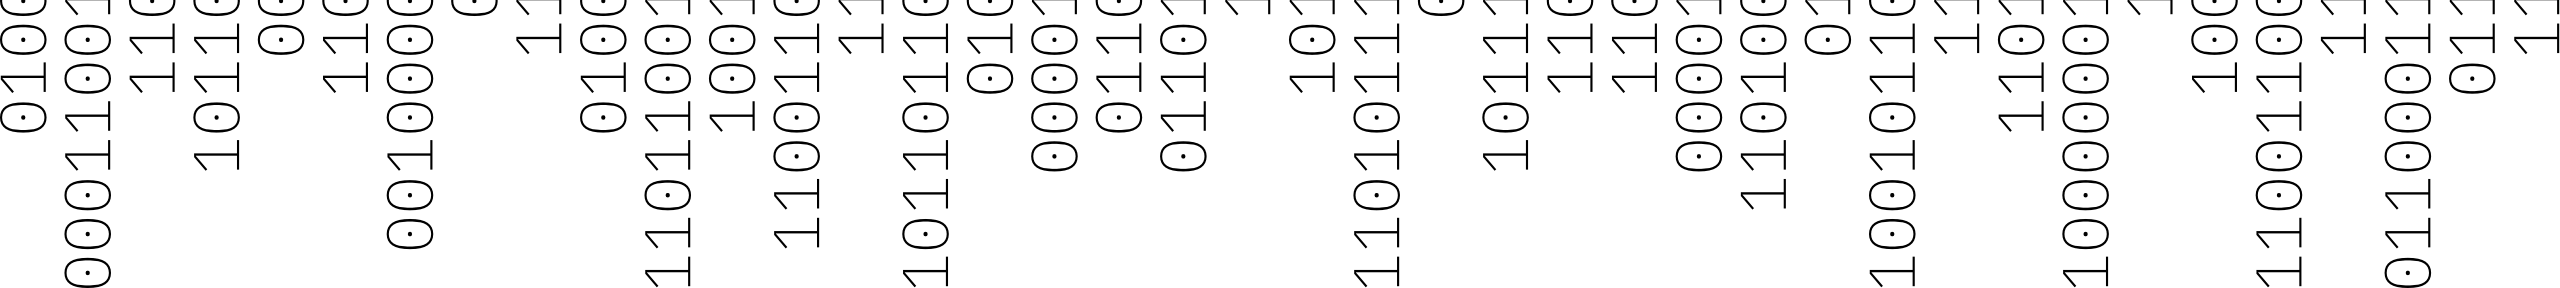 binary_bottom